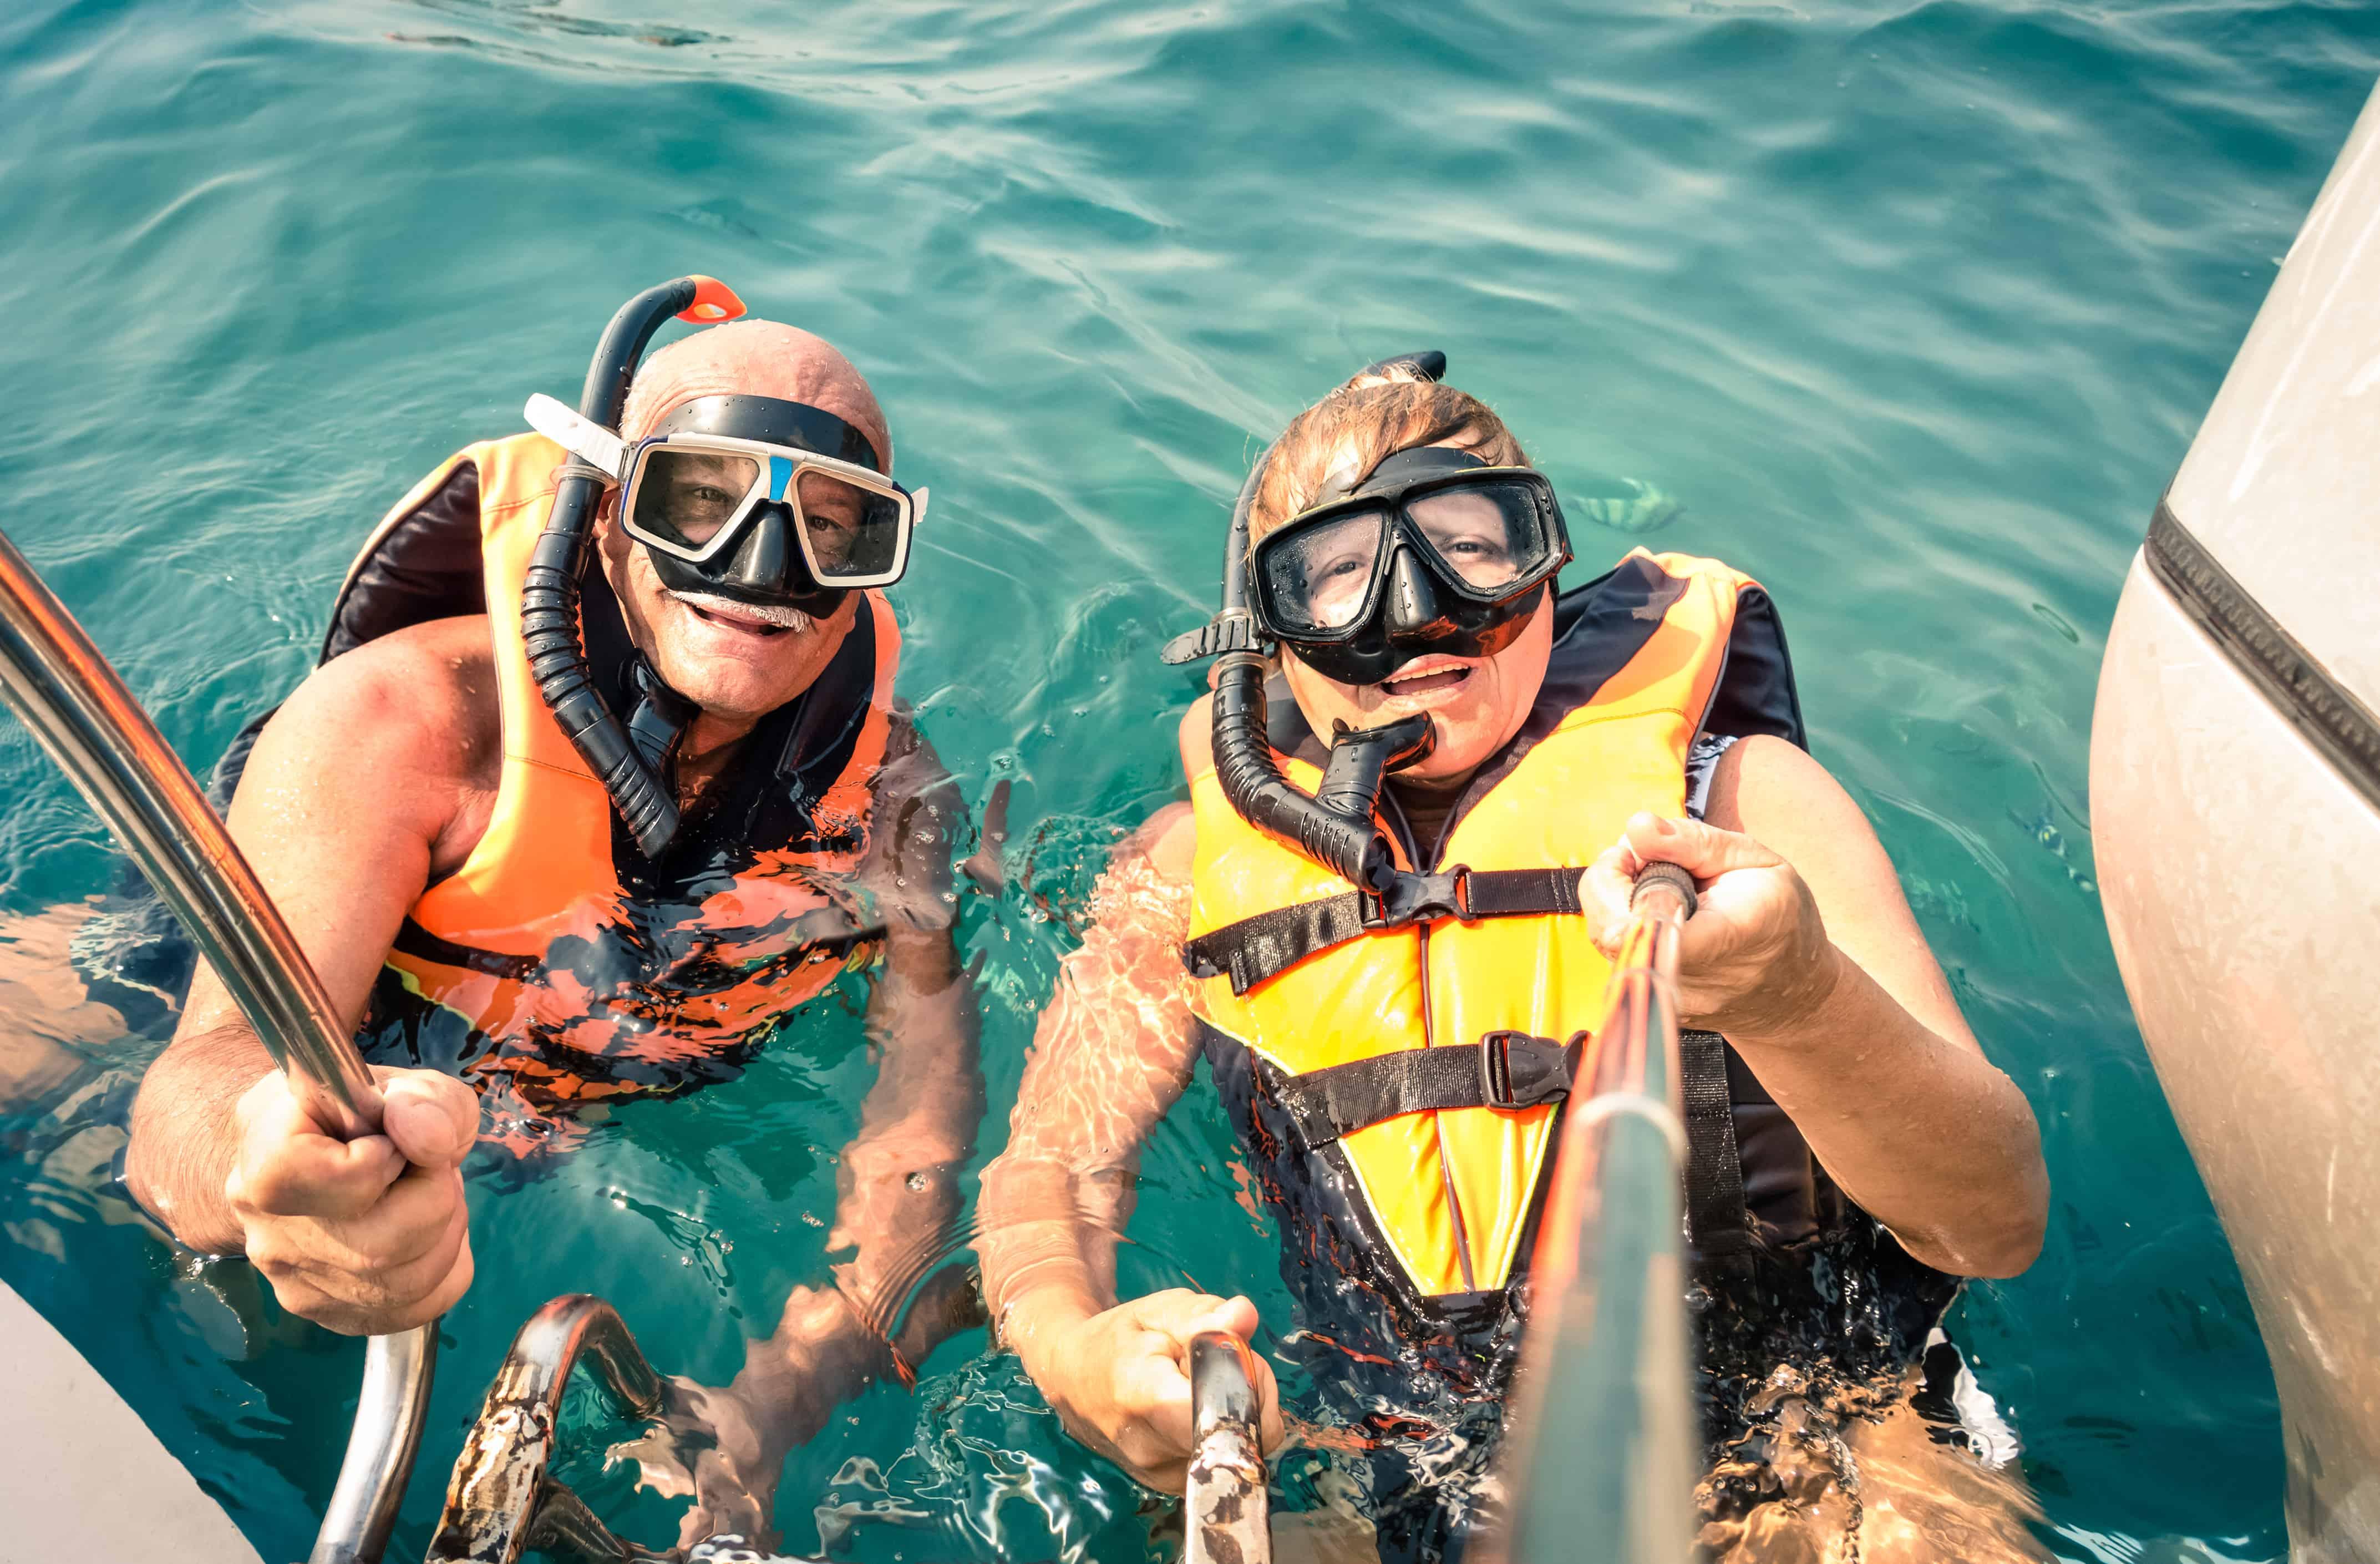 Using a Snorkel Vest